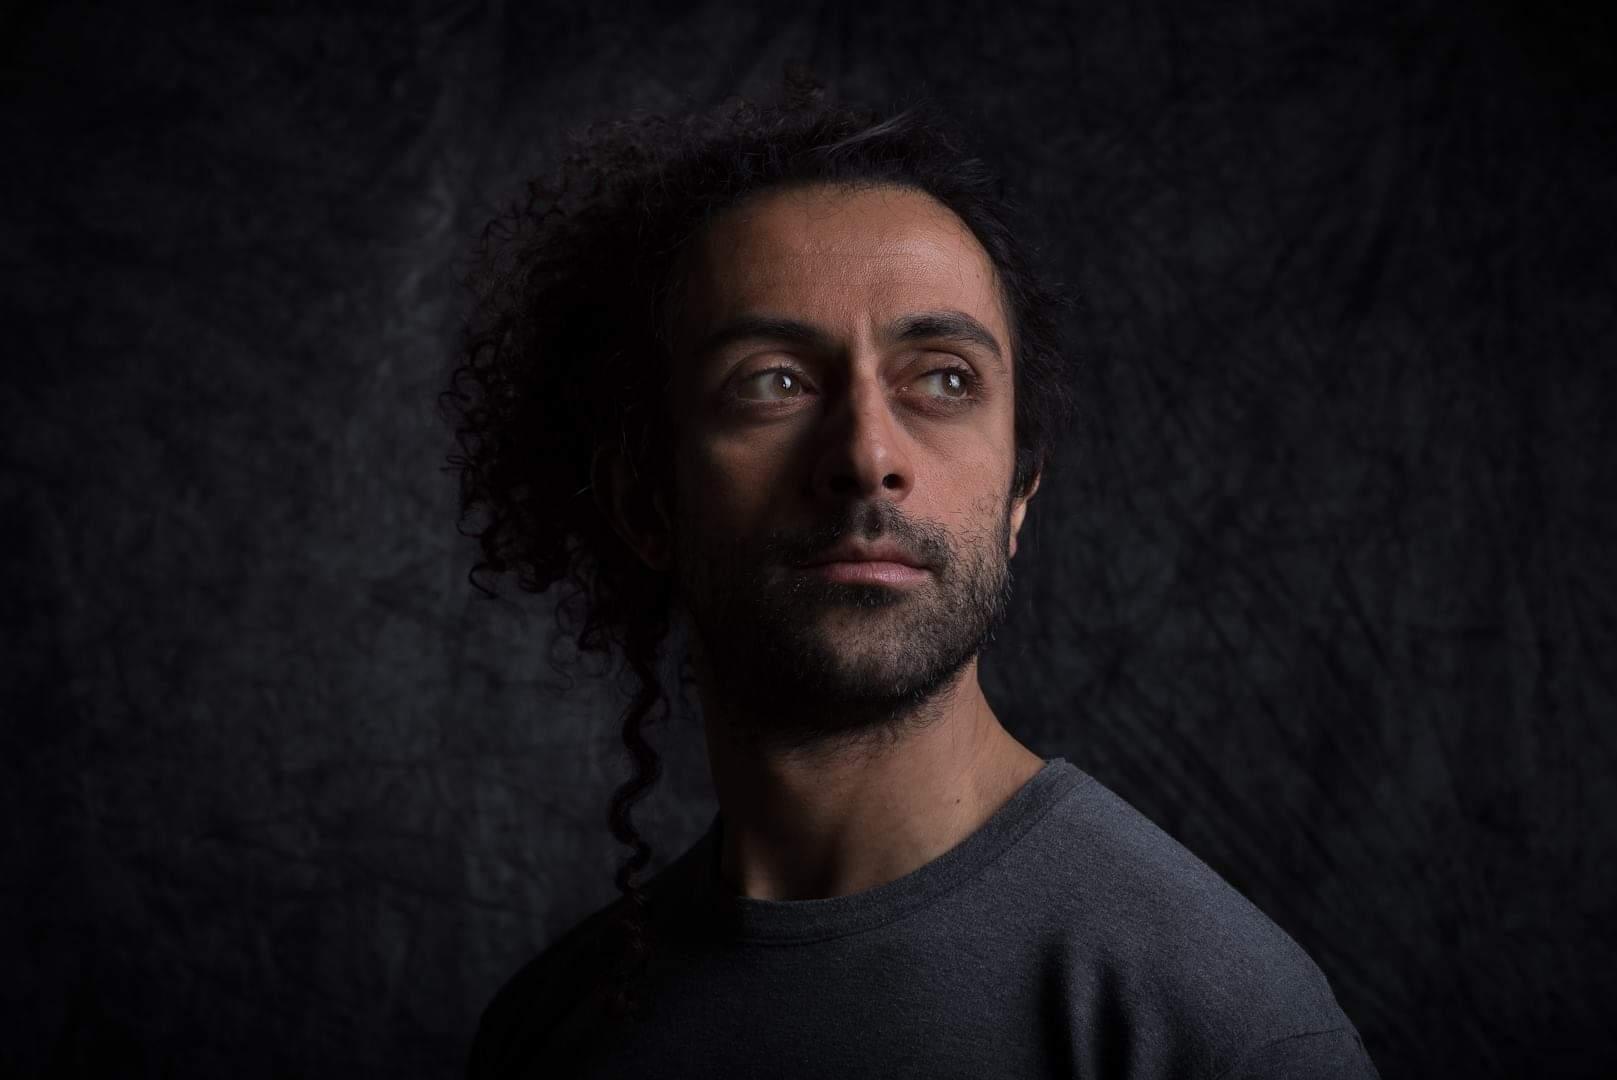 Enrico Mazzone